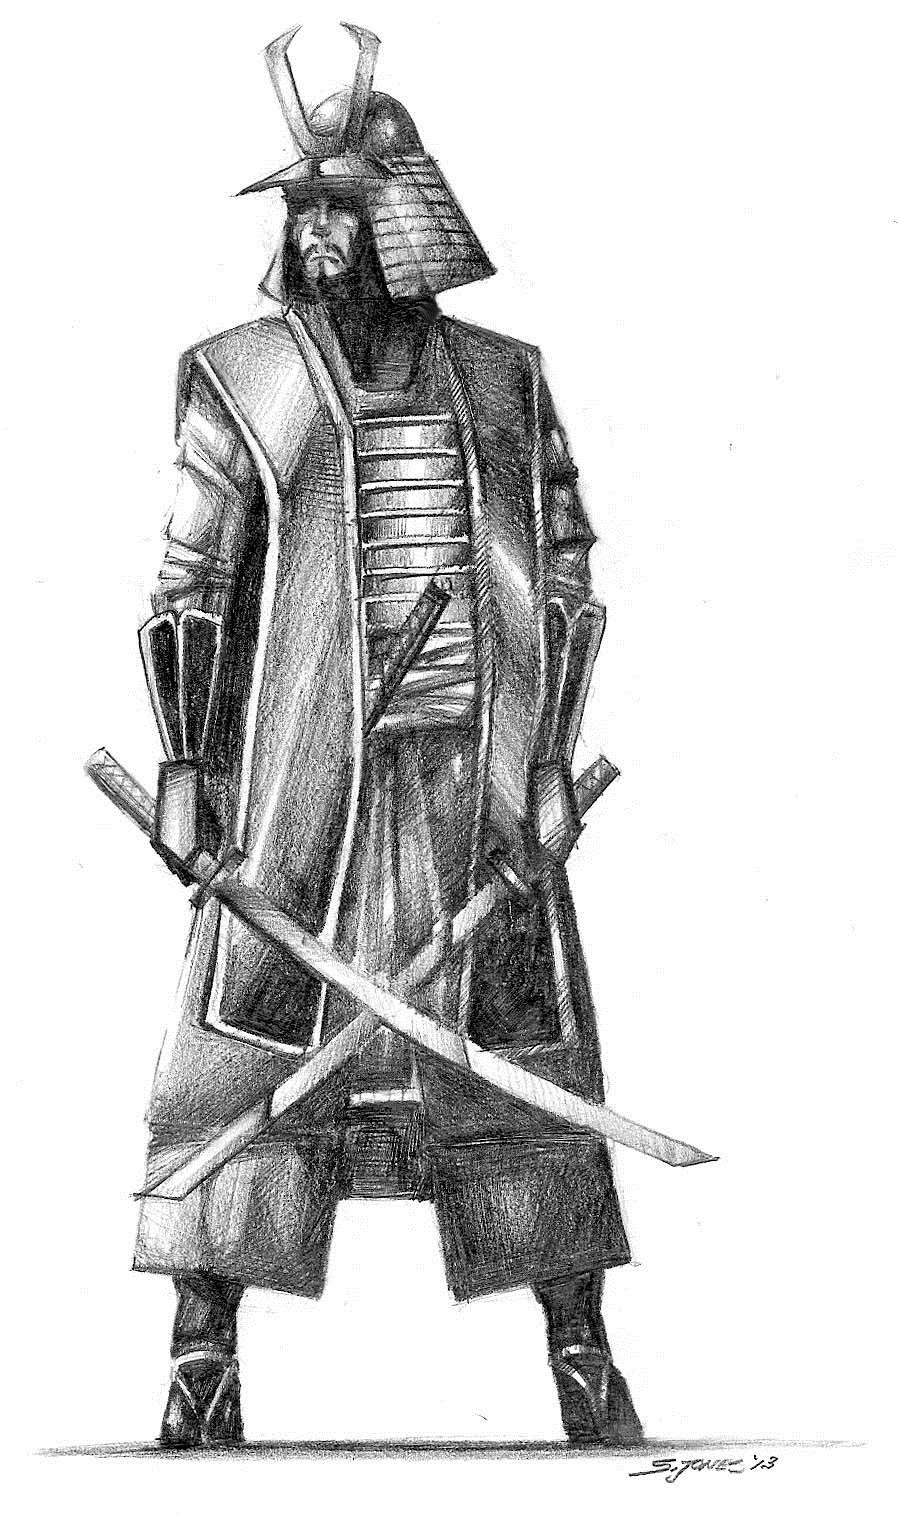 Drawn samurai bushido My Warriors Weapons & Mind: